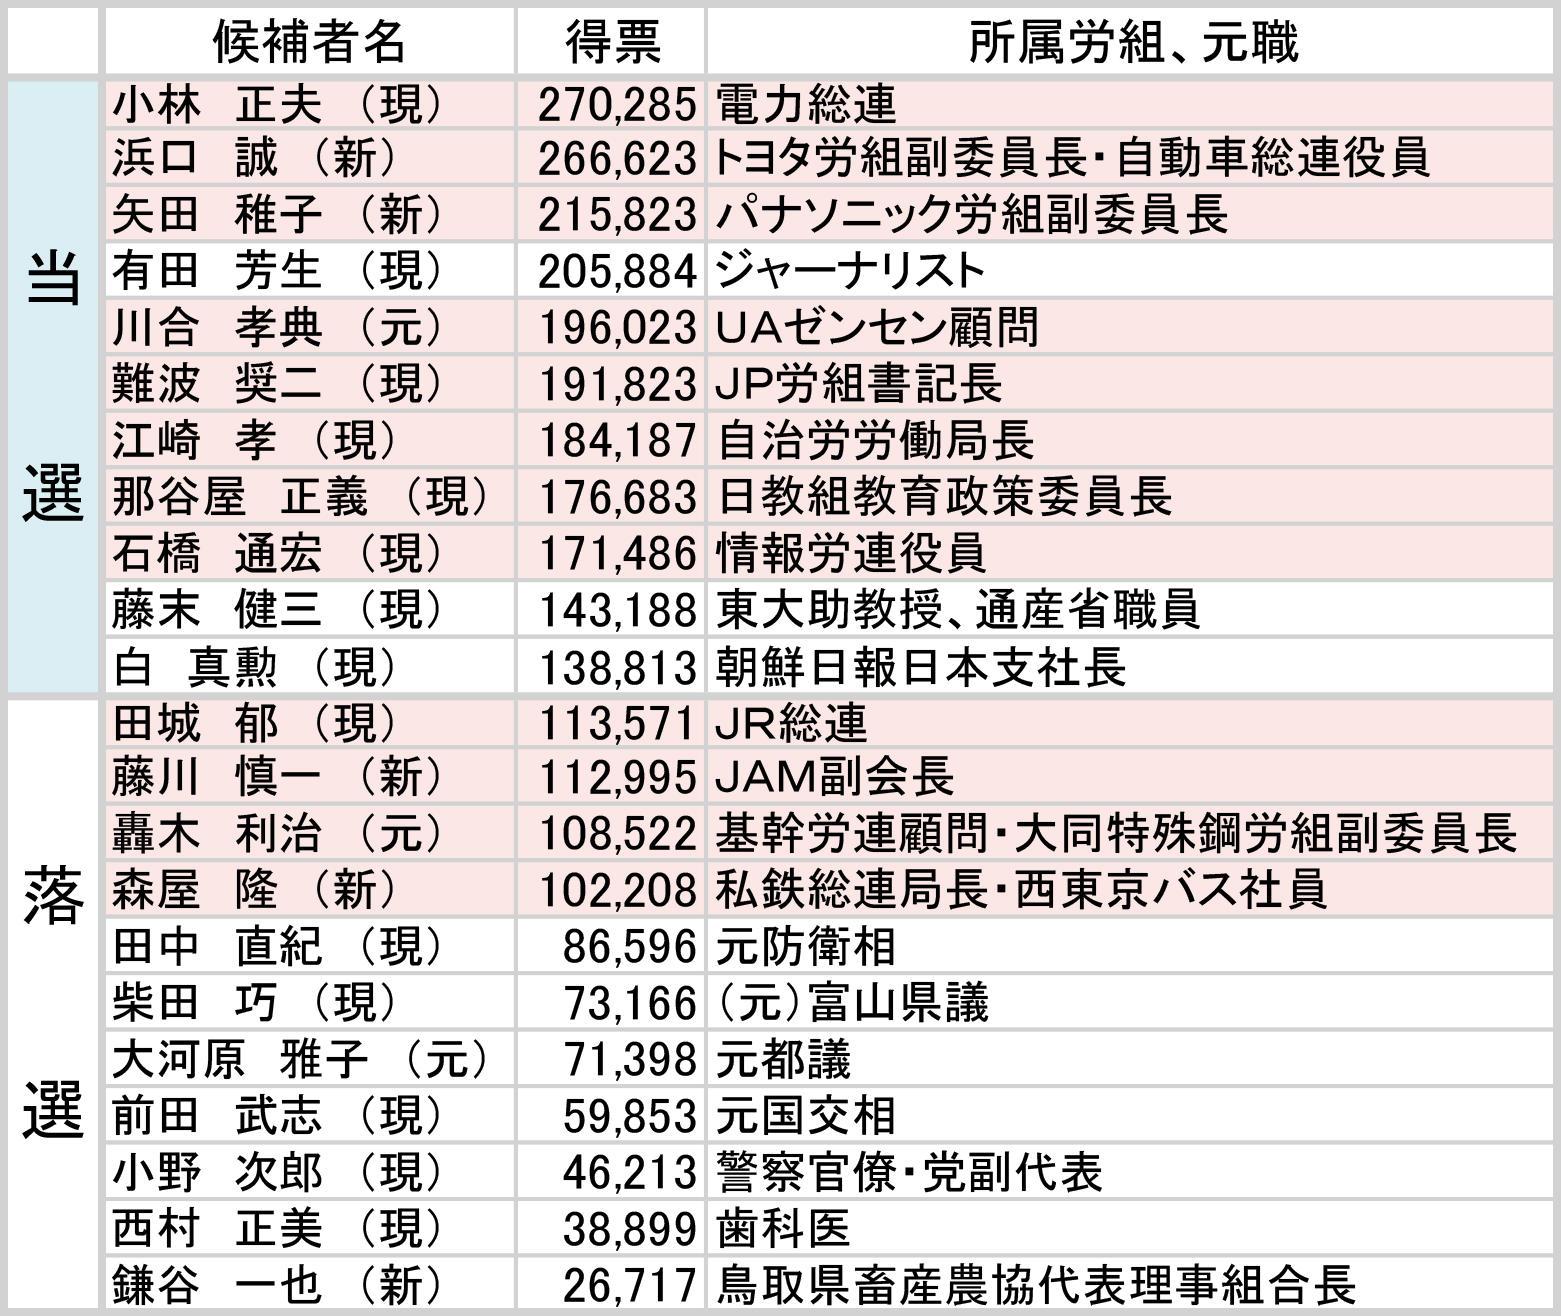 http://hunter-investigate.jp/news/0761cdb3db5668262cece91118ee3ad0e95b33ee.jpg